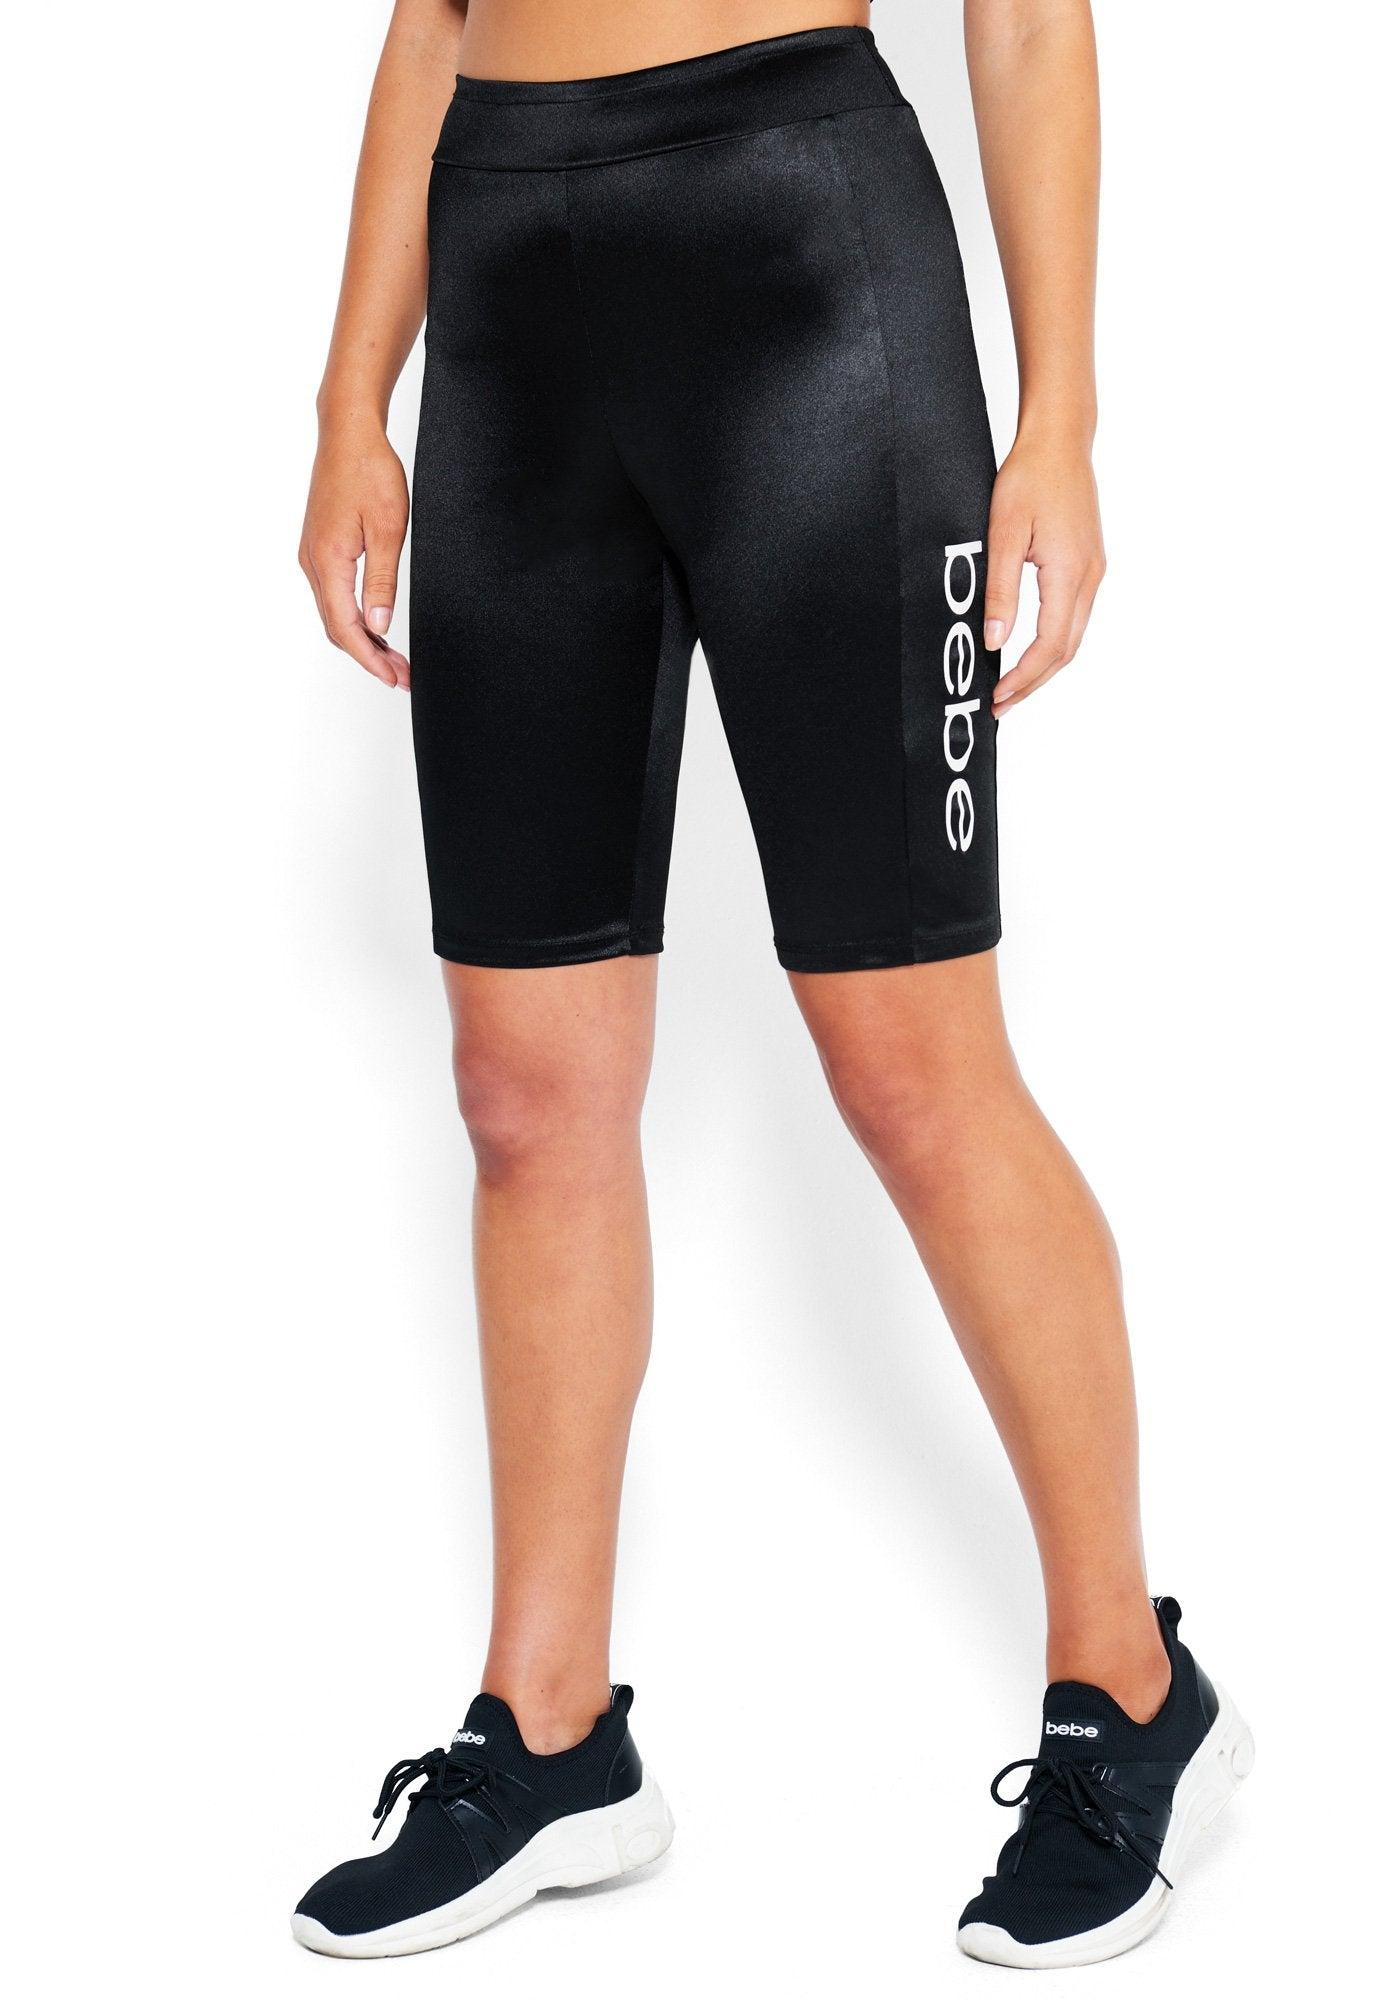 bebe Women's Mya Bebe Logo Bike Shorts, Size Small in Black Spandex